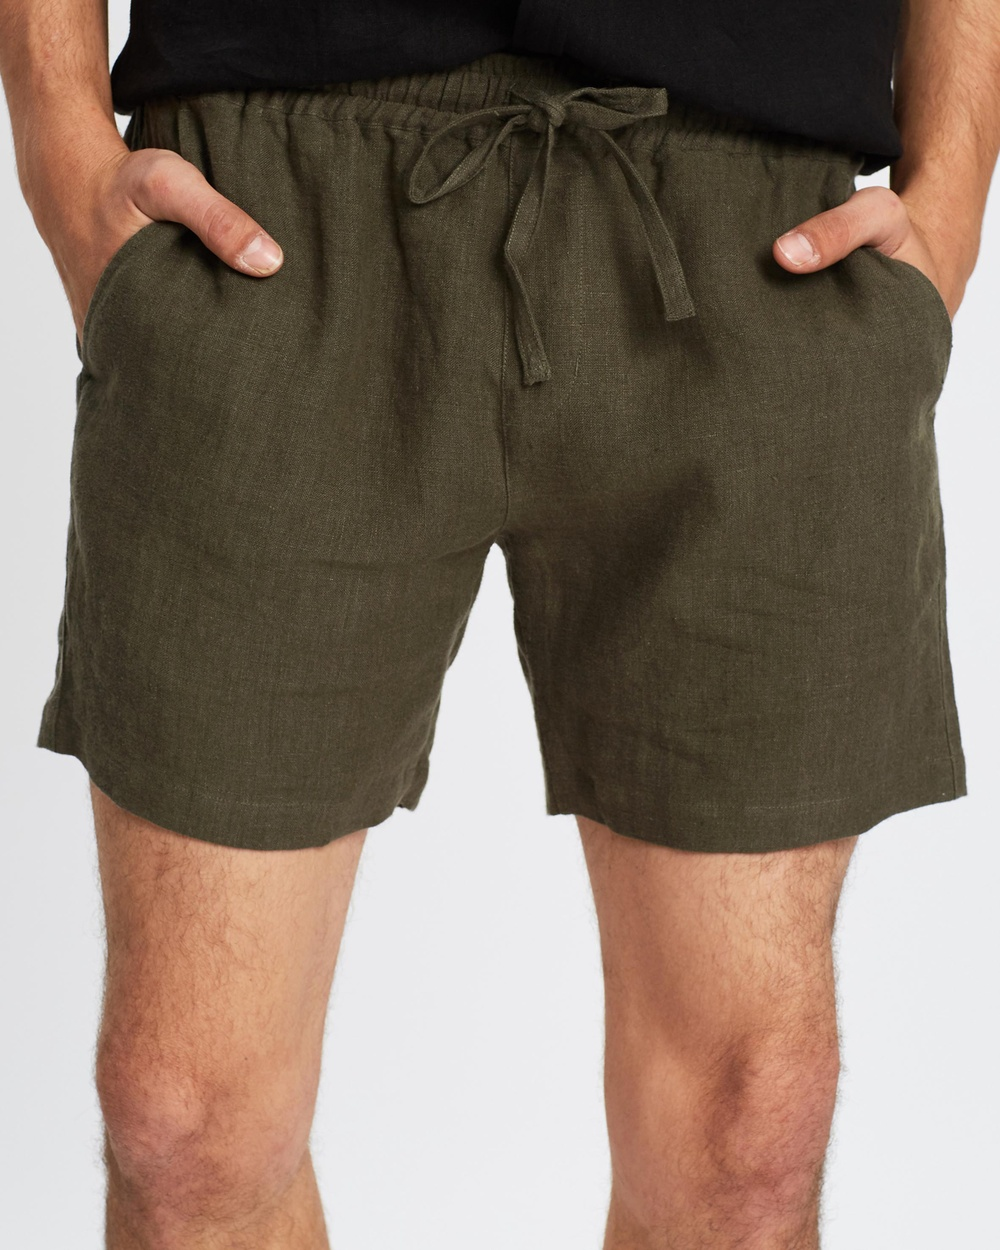 AERE Linen Pull On Shorts Khaki